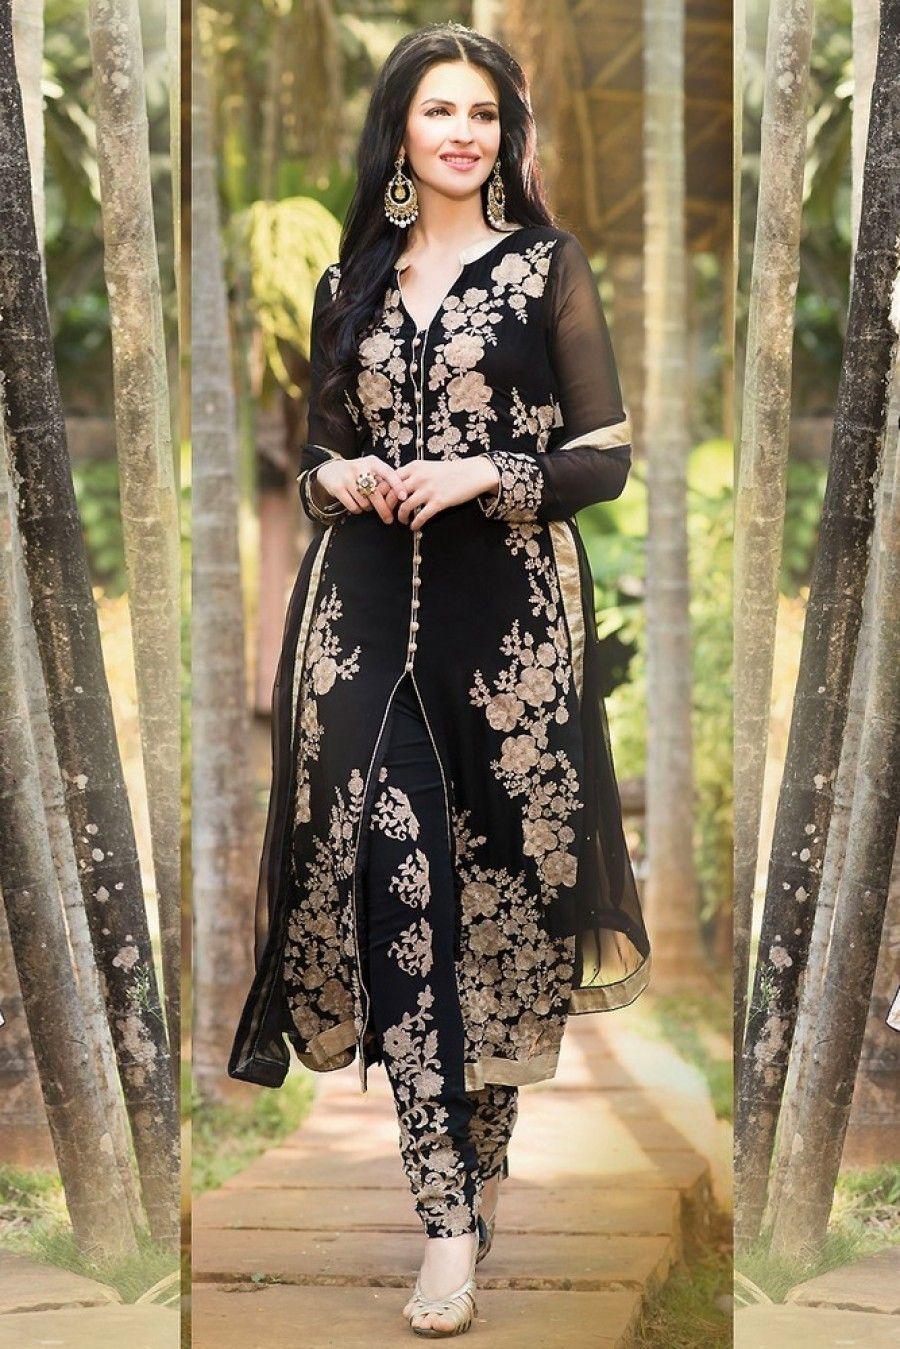 Designer salwar kameez mesmeric peach color net designer suit - Pearl Embroidery Designs For Suits Google Search Pearl Embroiderydesigner Salwar Kameezchuridar Suitsanarkaliblack Colorsembroidery